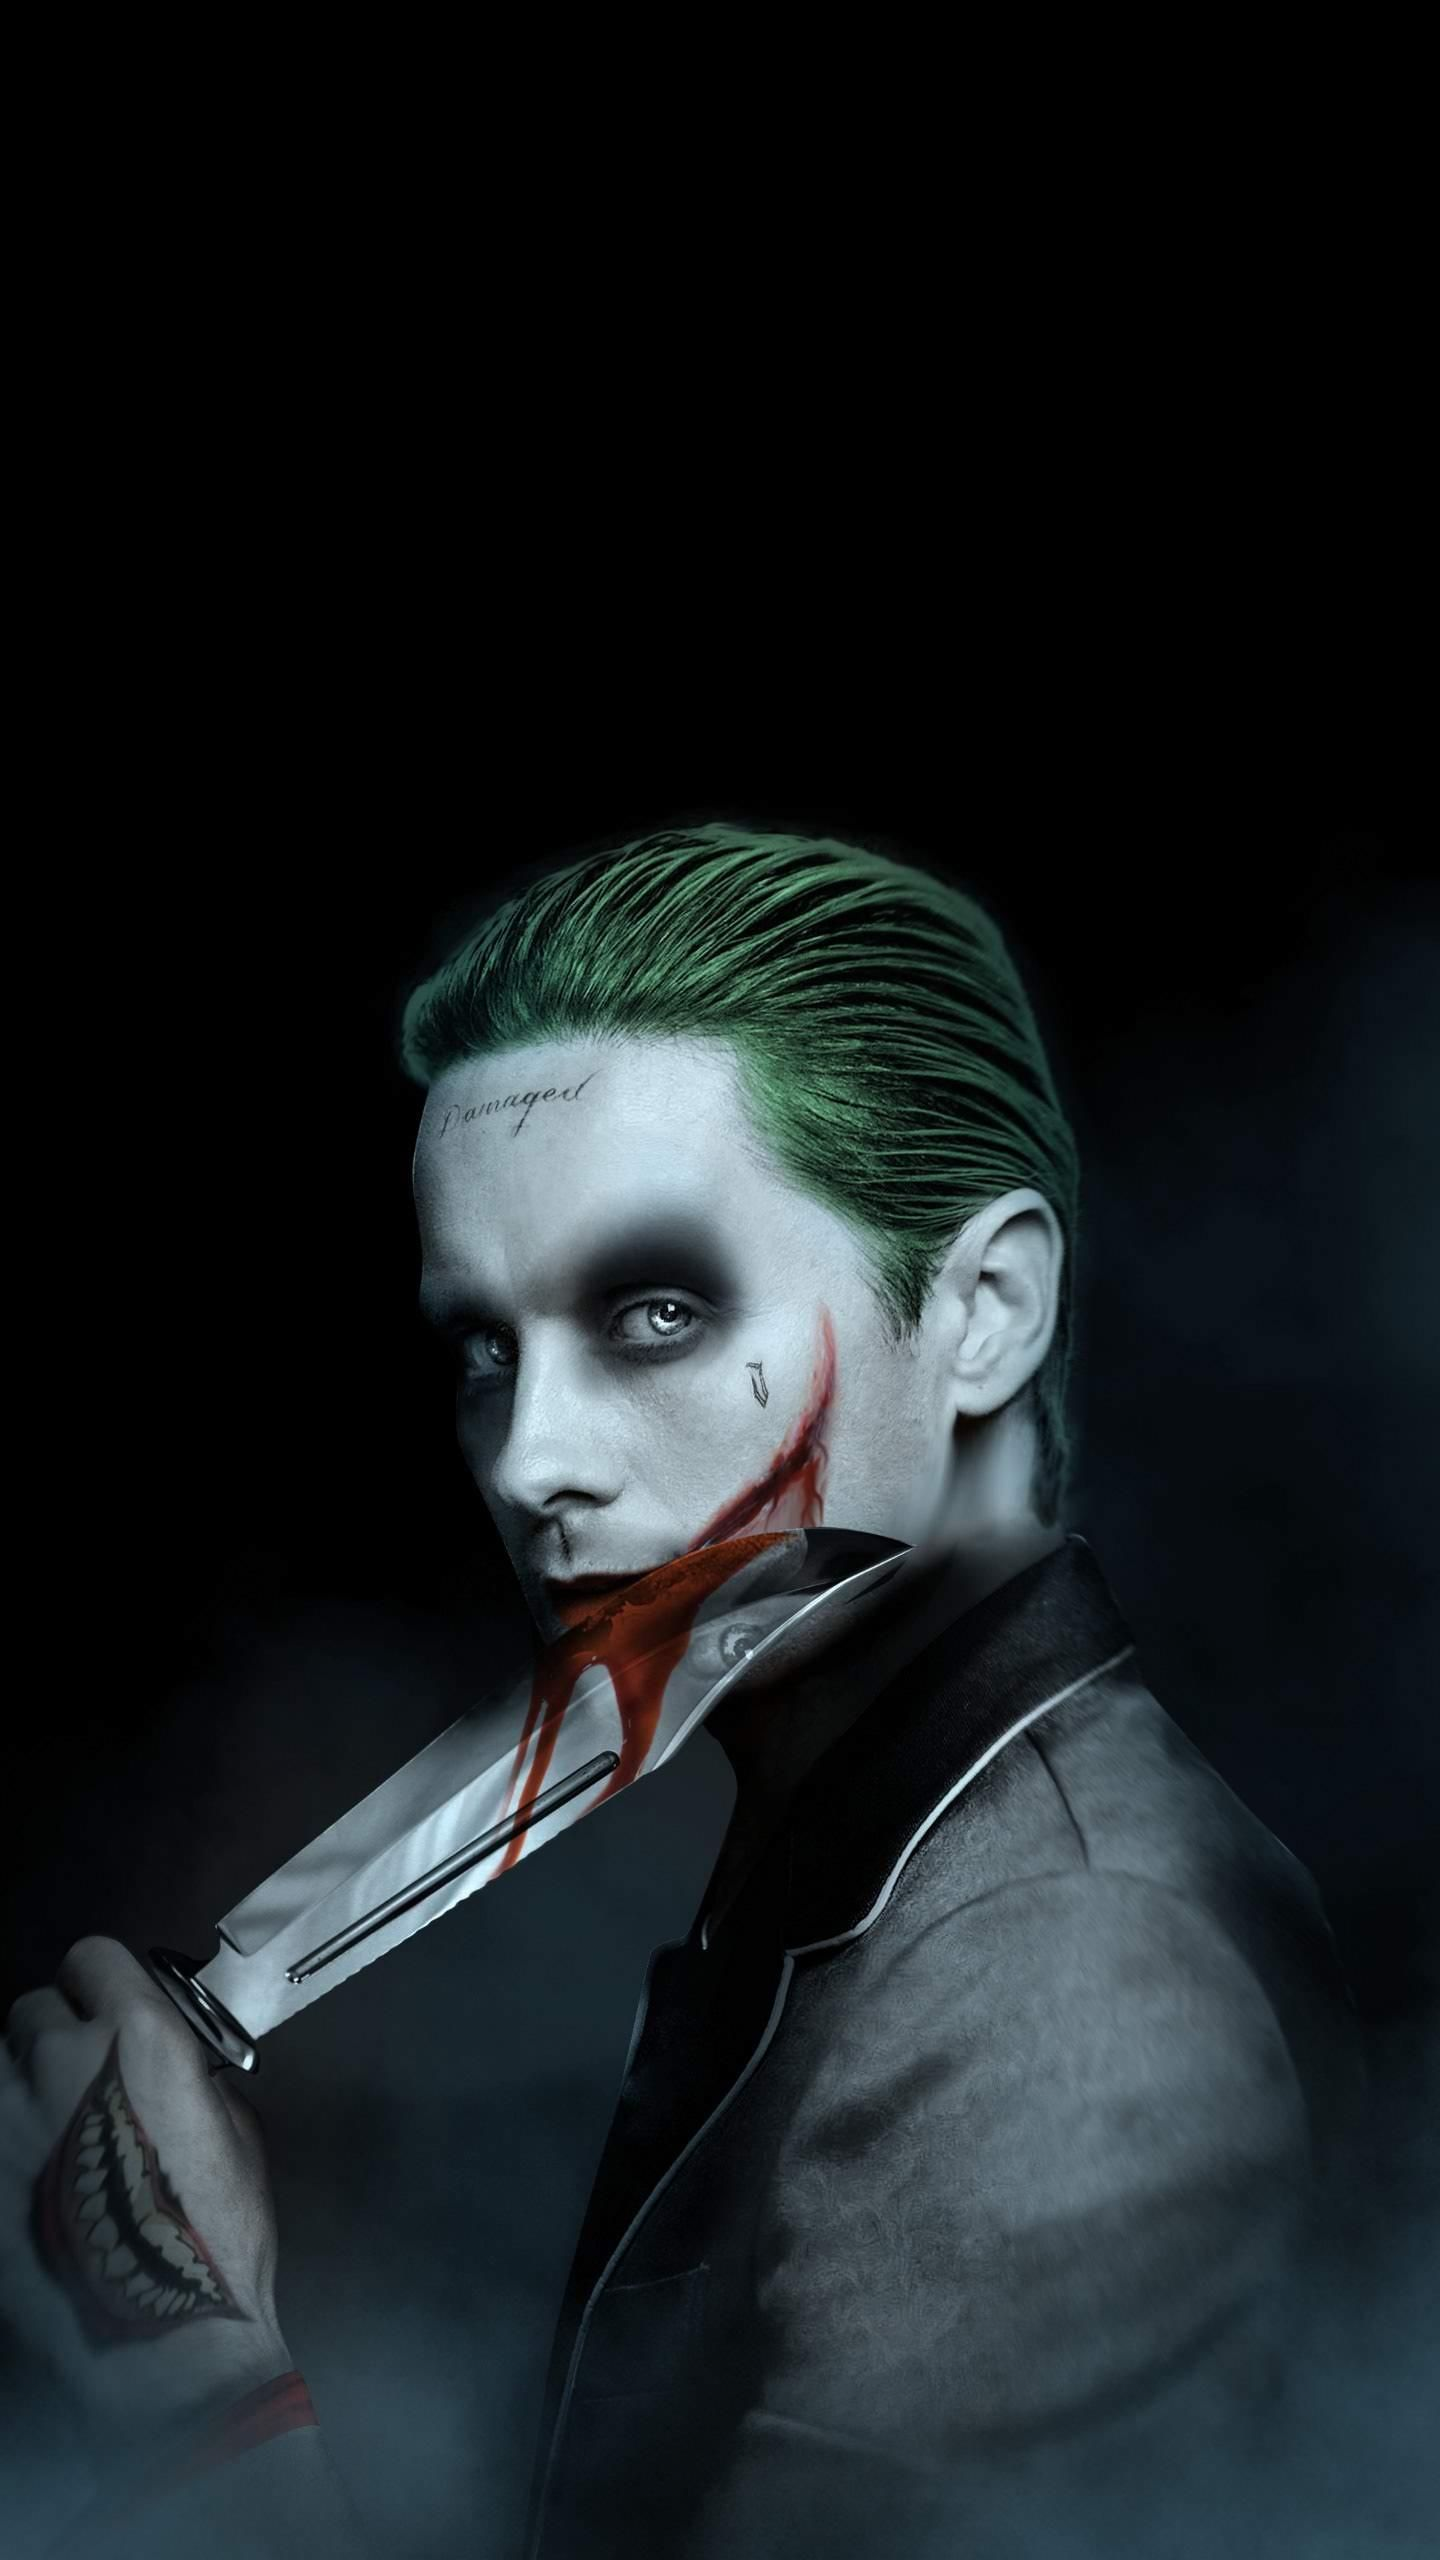 The Joker Joker Wallpapers Joker Iphone Wallpaper Joker Pics